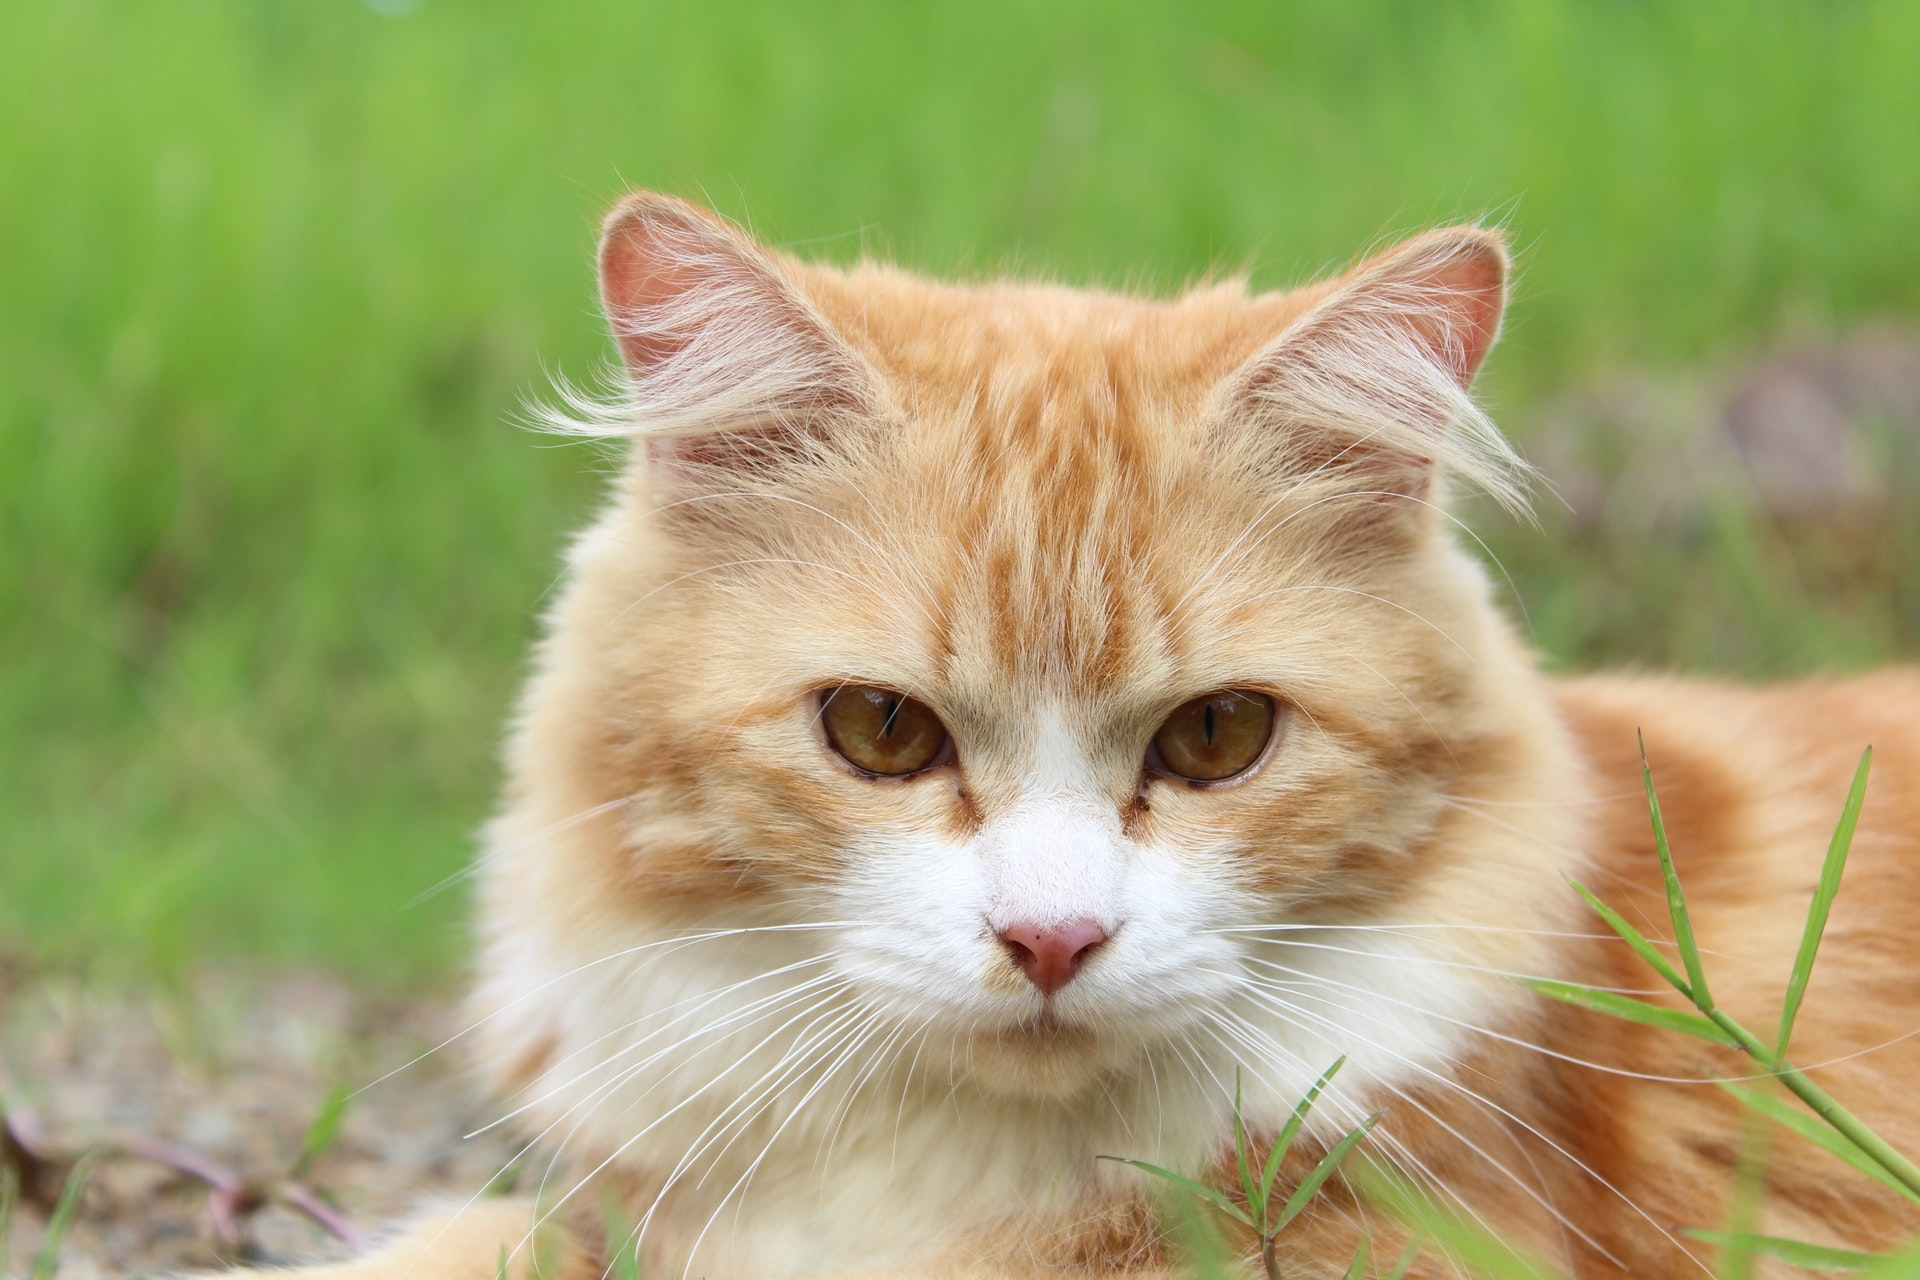 cat-feline-kitty-kitten-39380